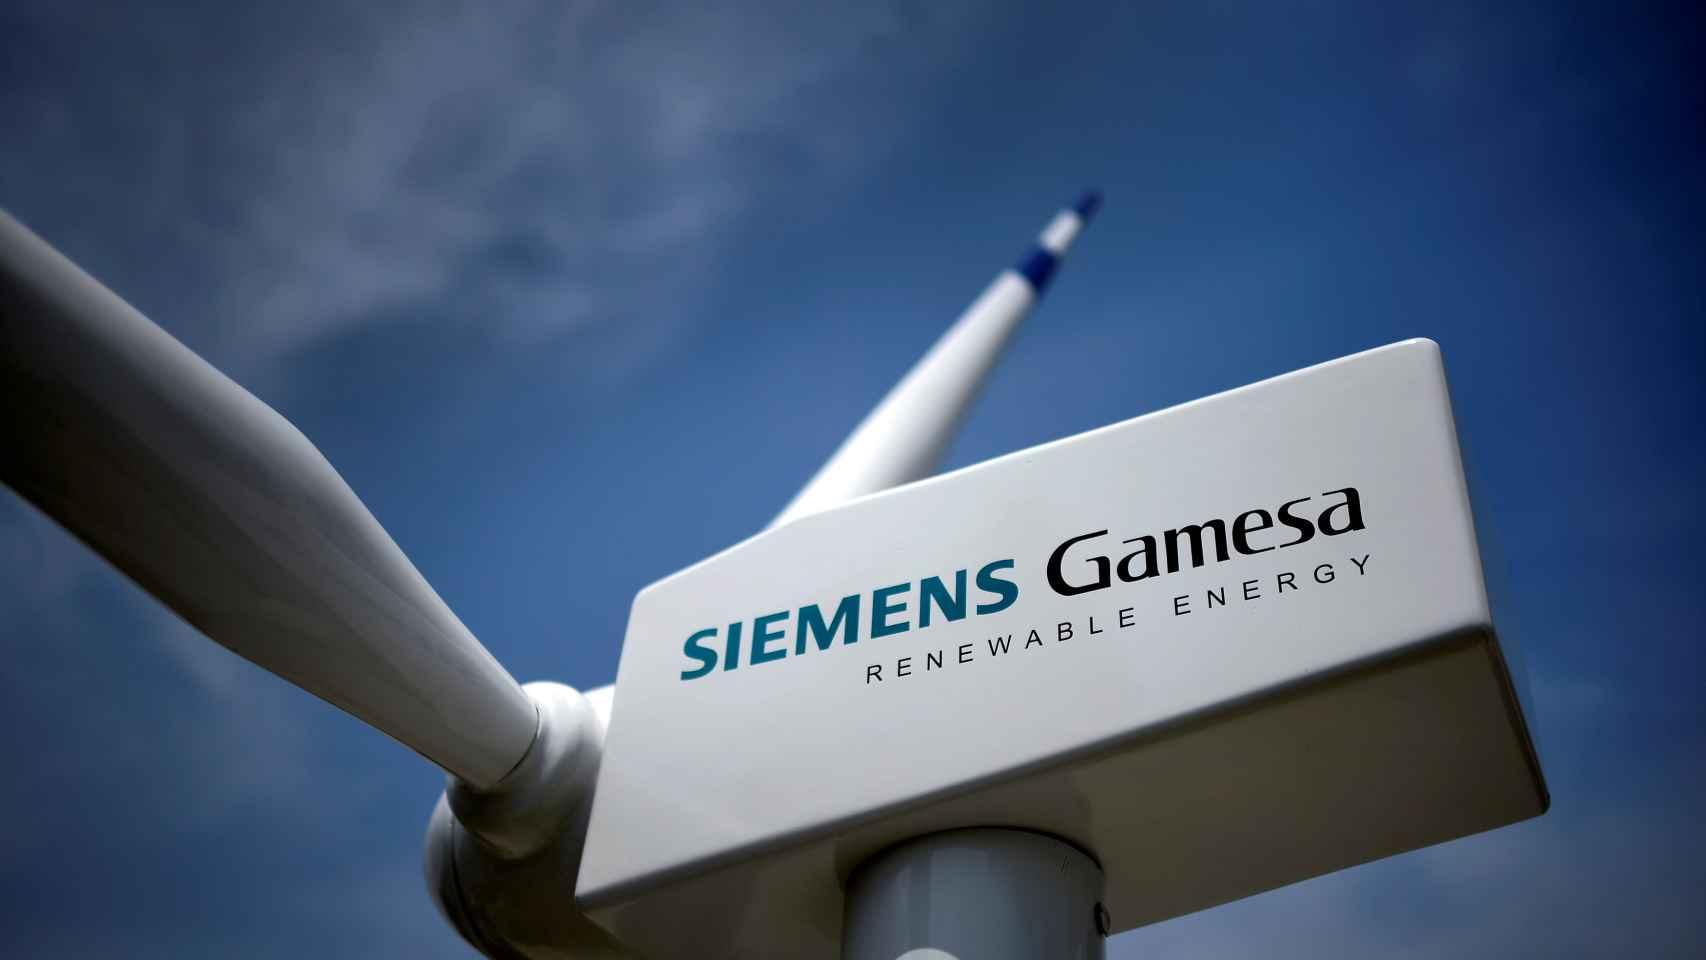 Imagen de una turbina eólica de Siemens Gamesa.